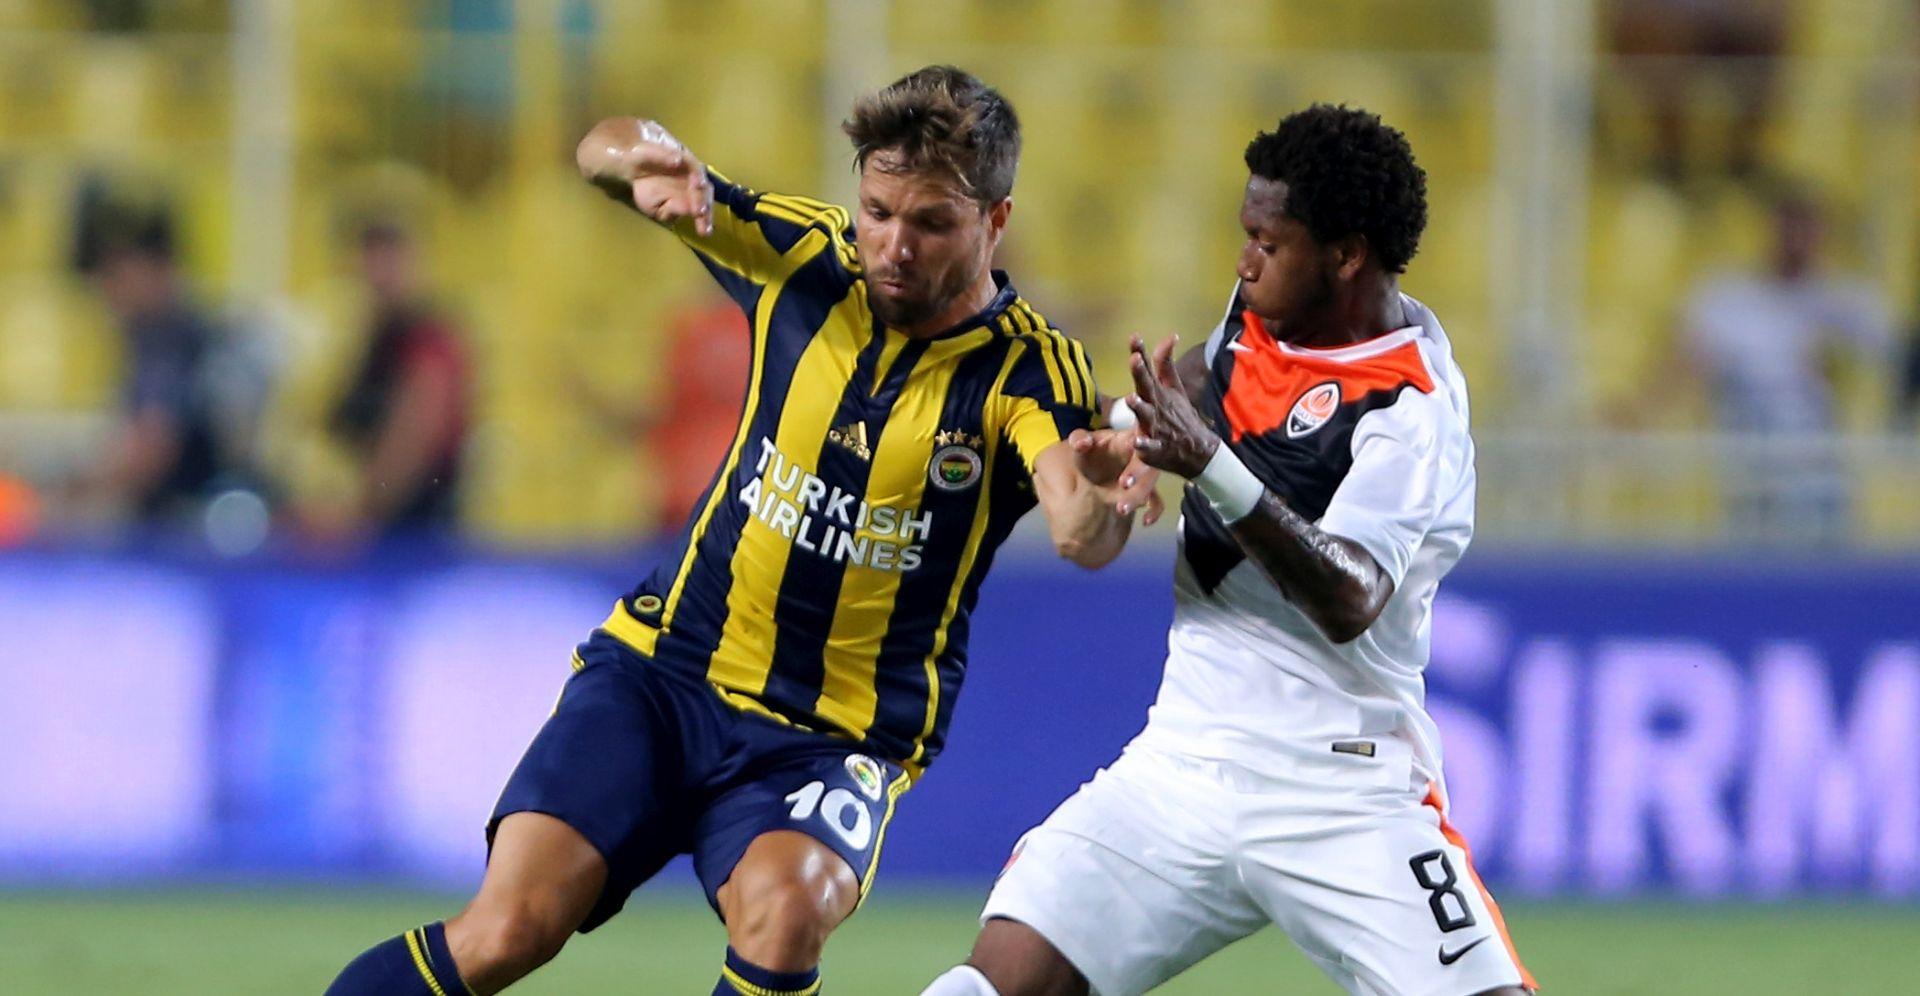 PAO NA DOPING TESTU: UEFA nije nadležna za slučaj Freda